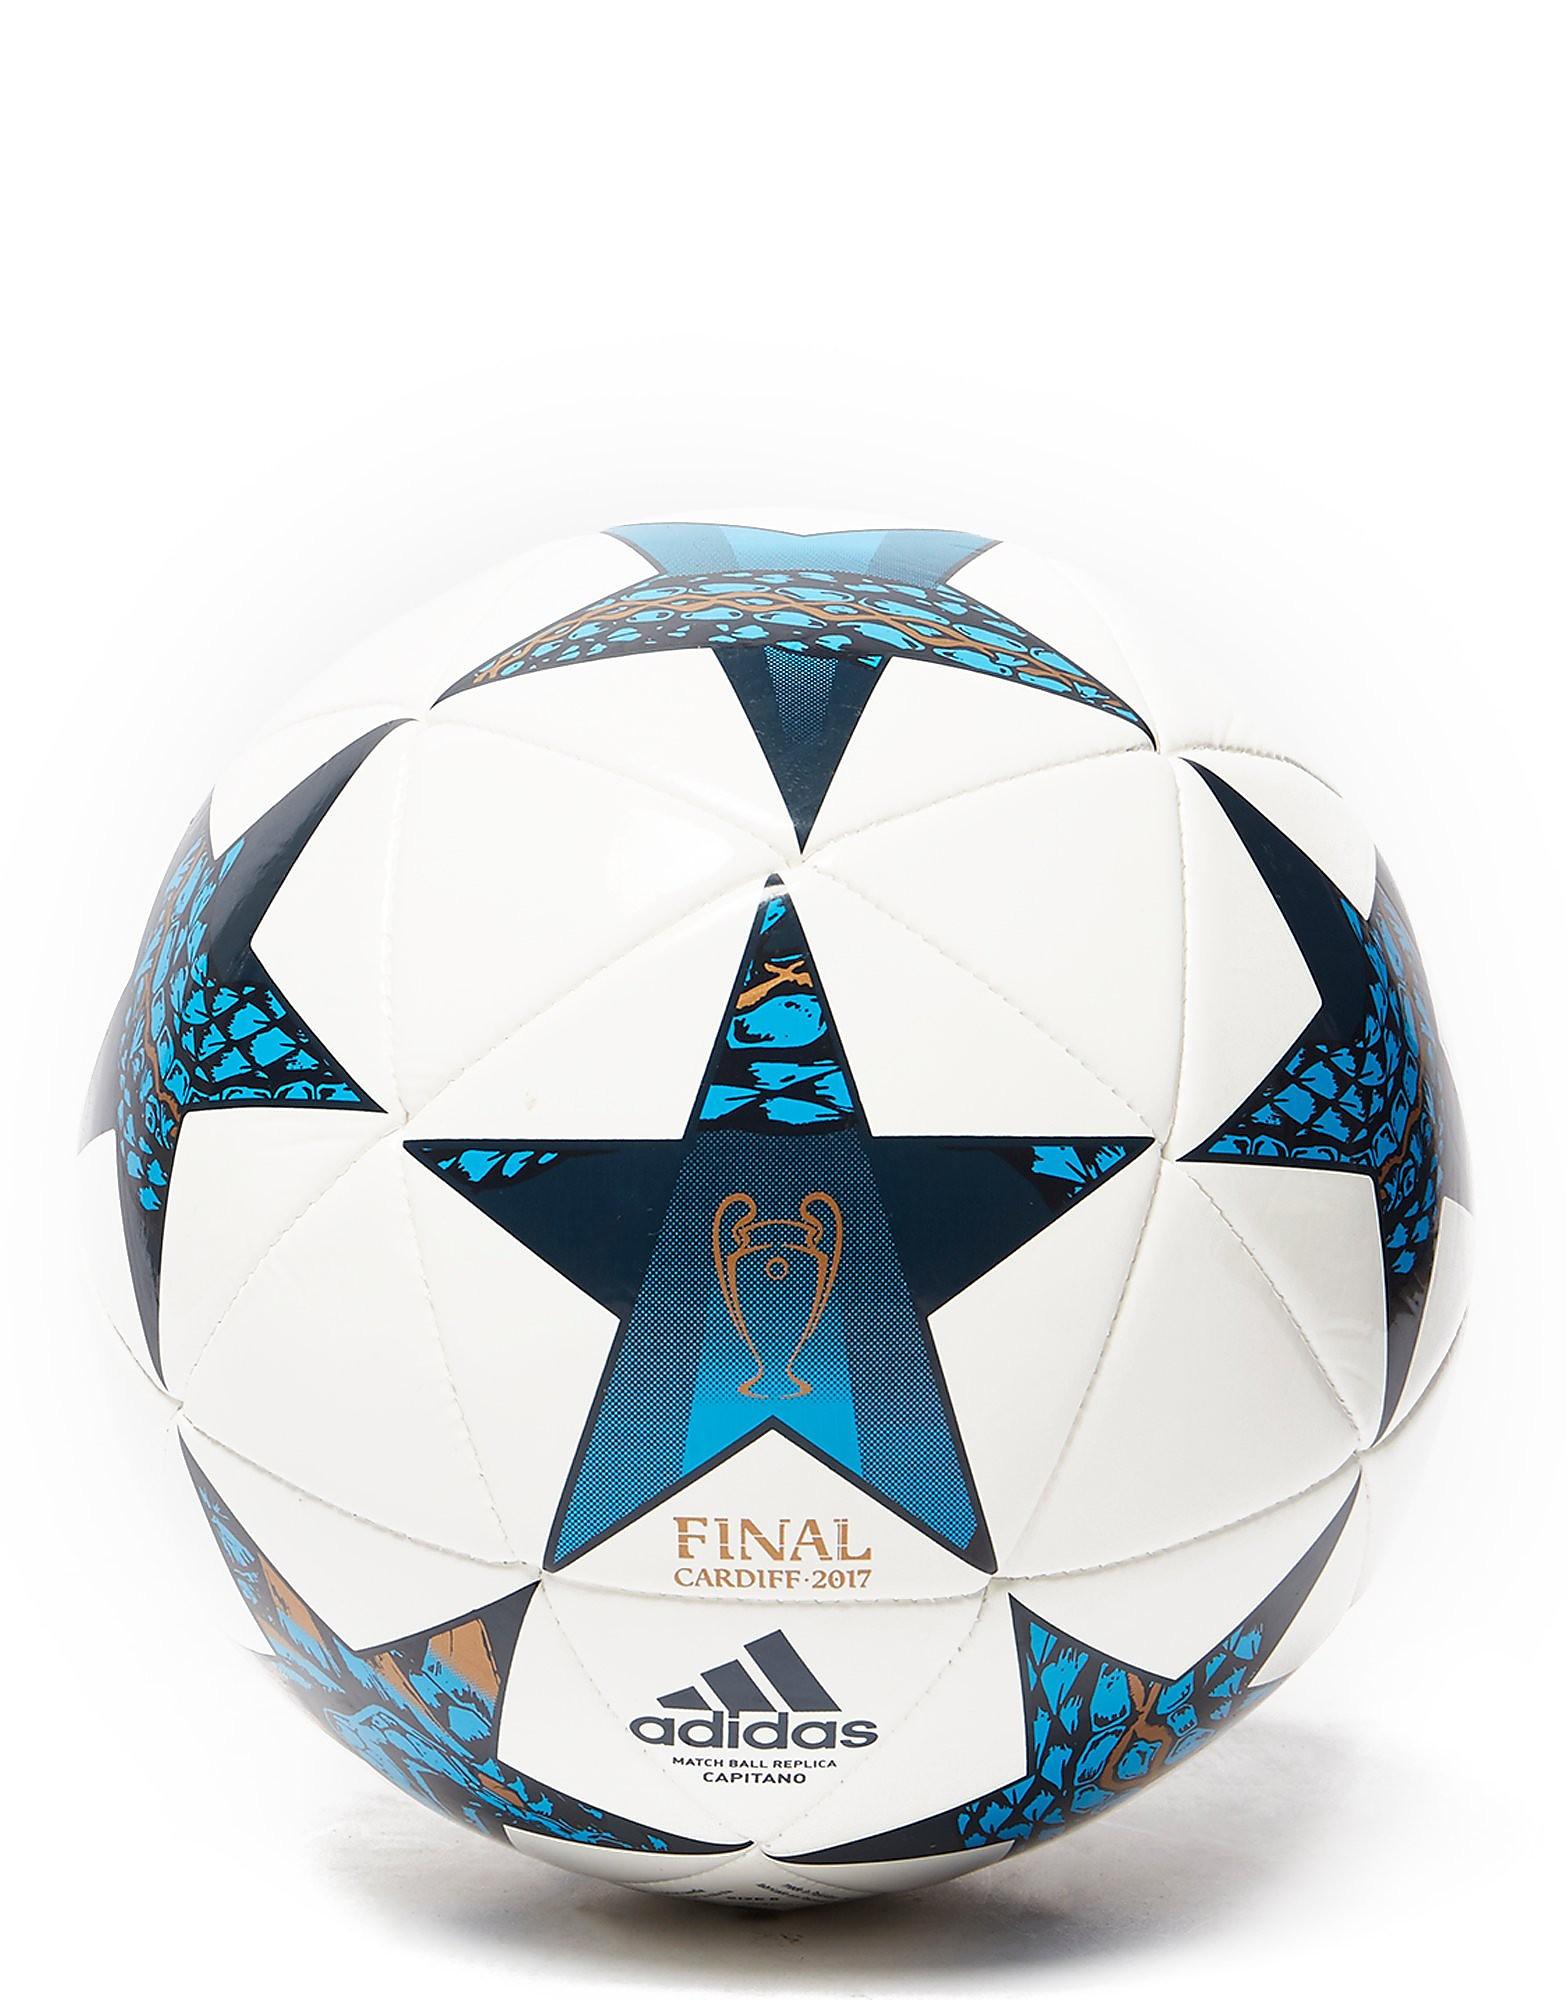 adidas Champions League Final 2017 Football